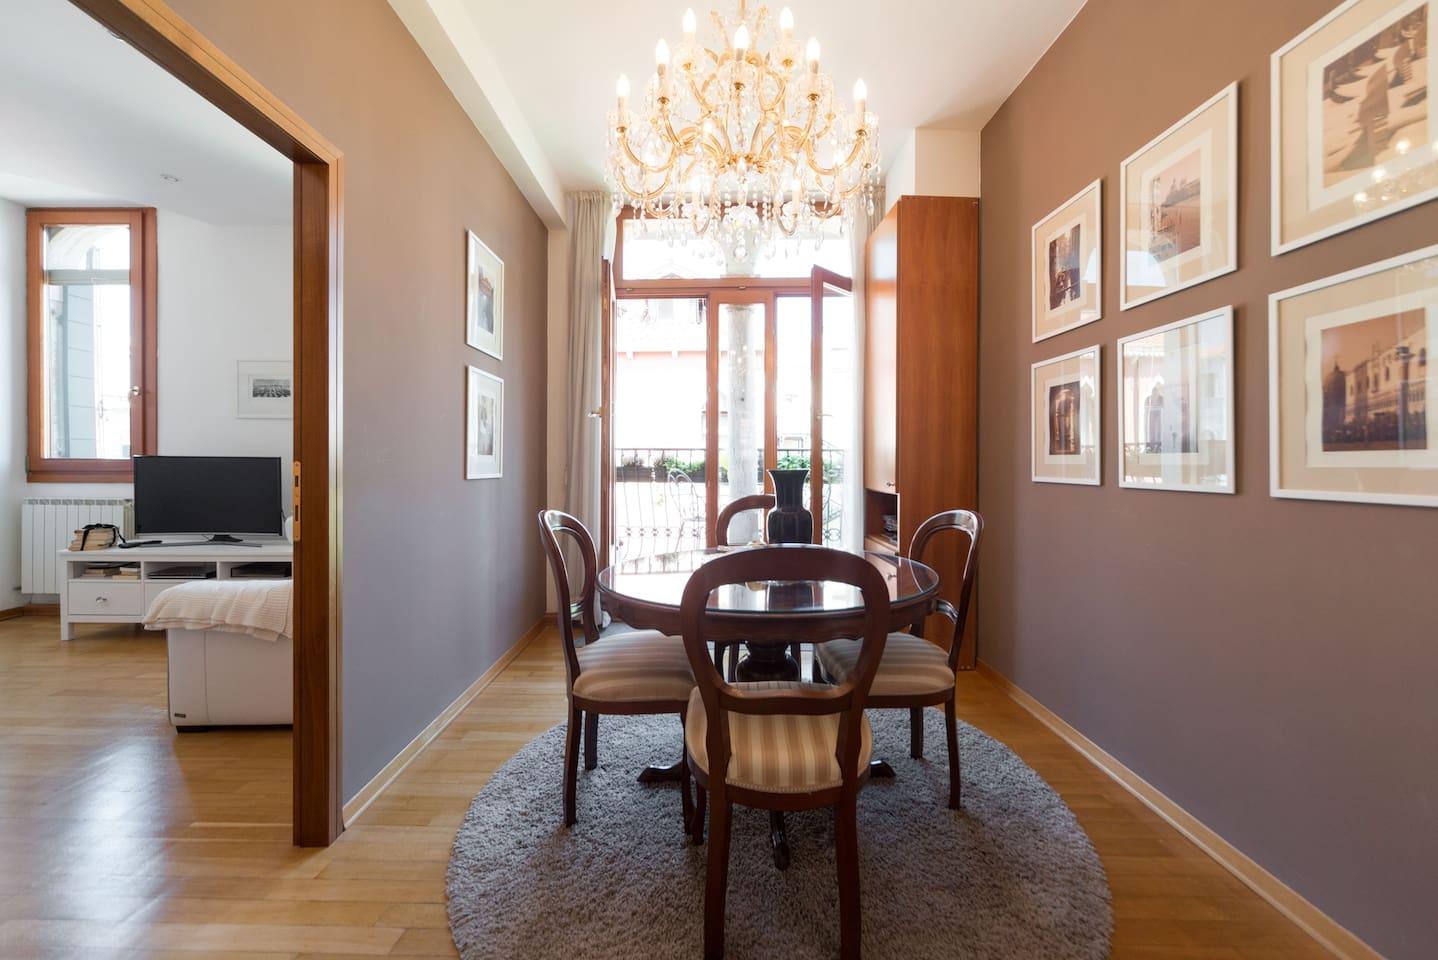 Dining room with Swarovski crystal chandelier